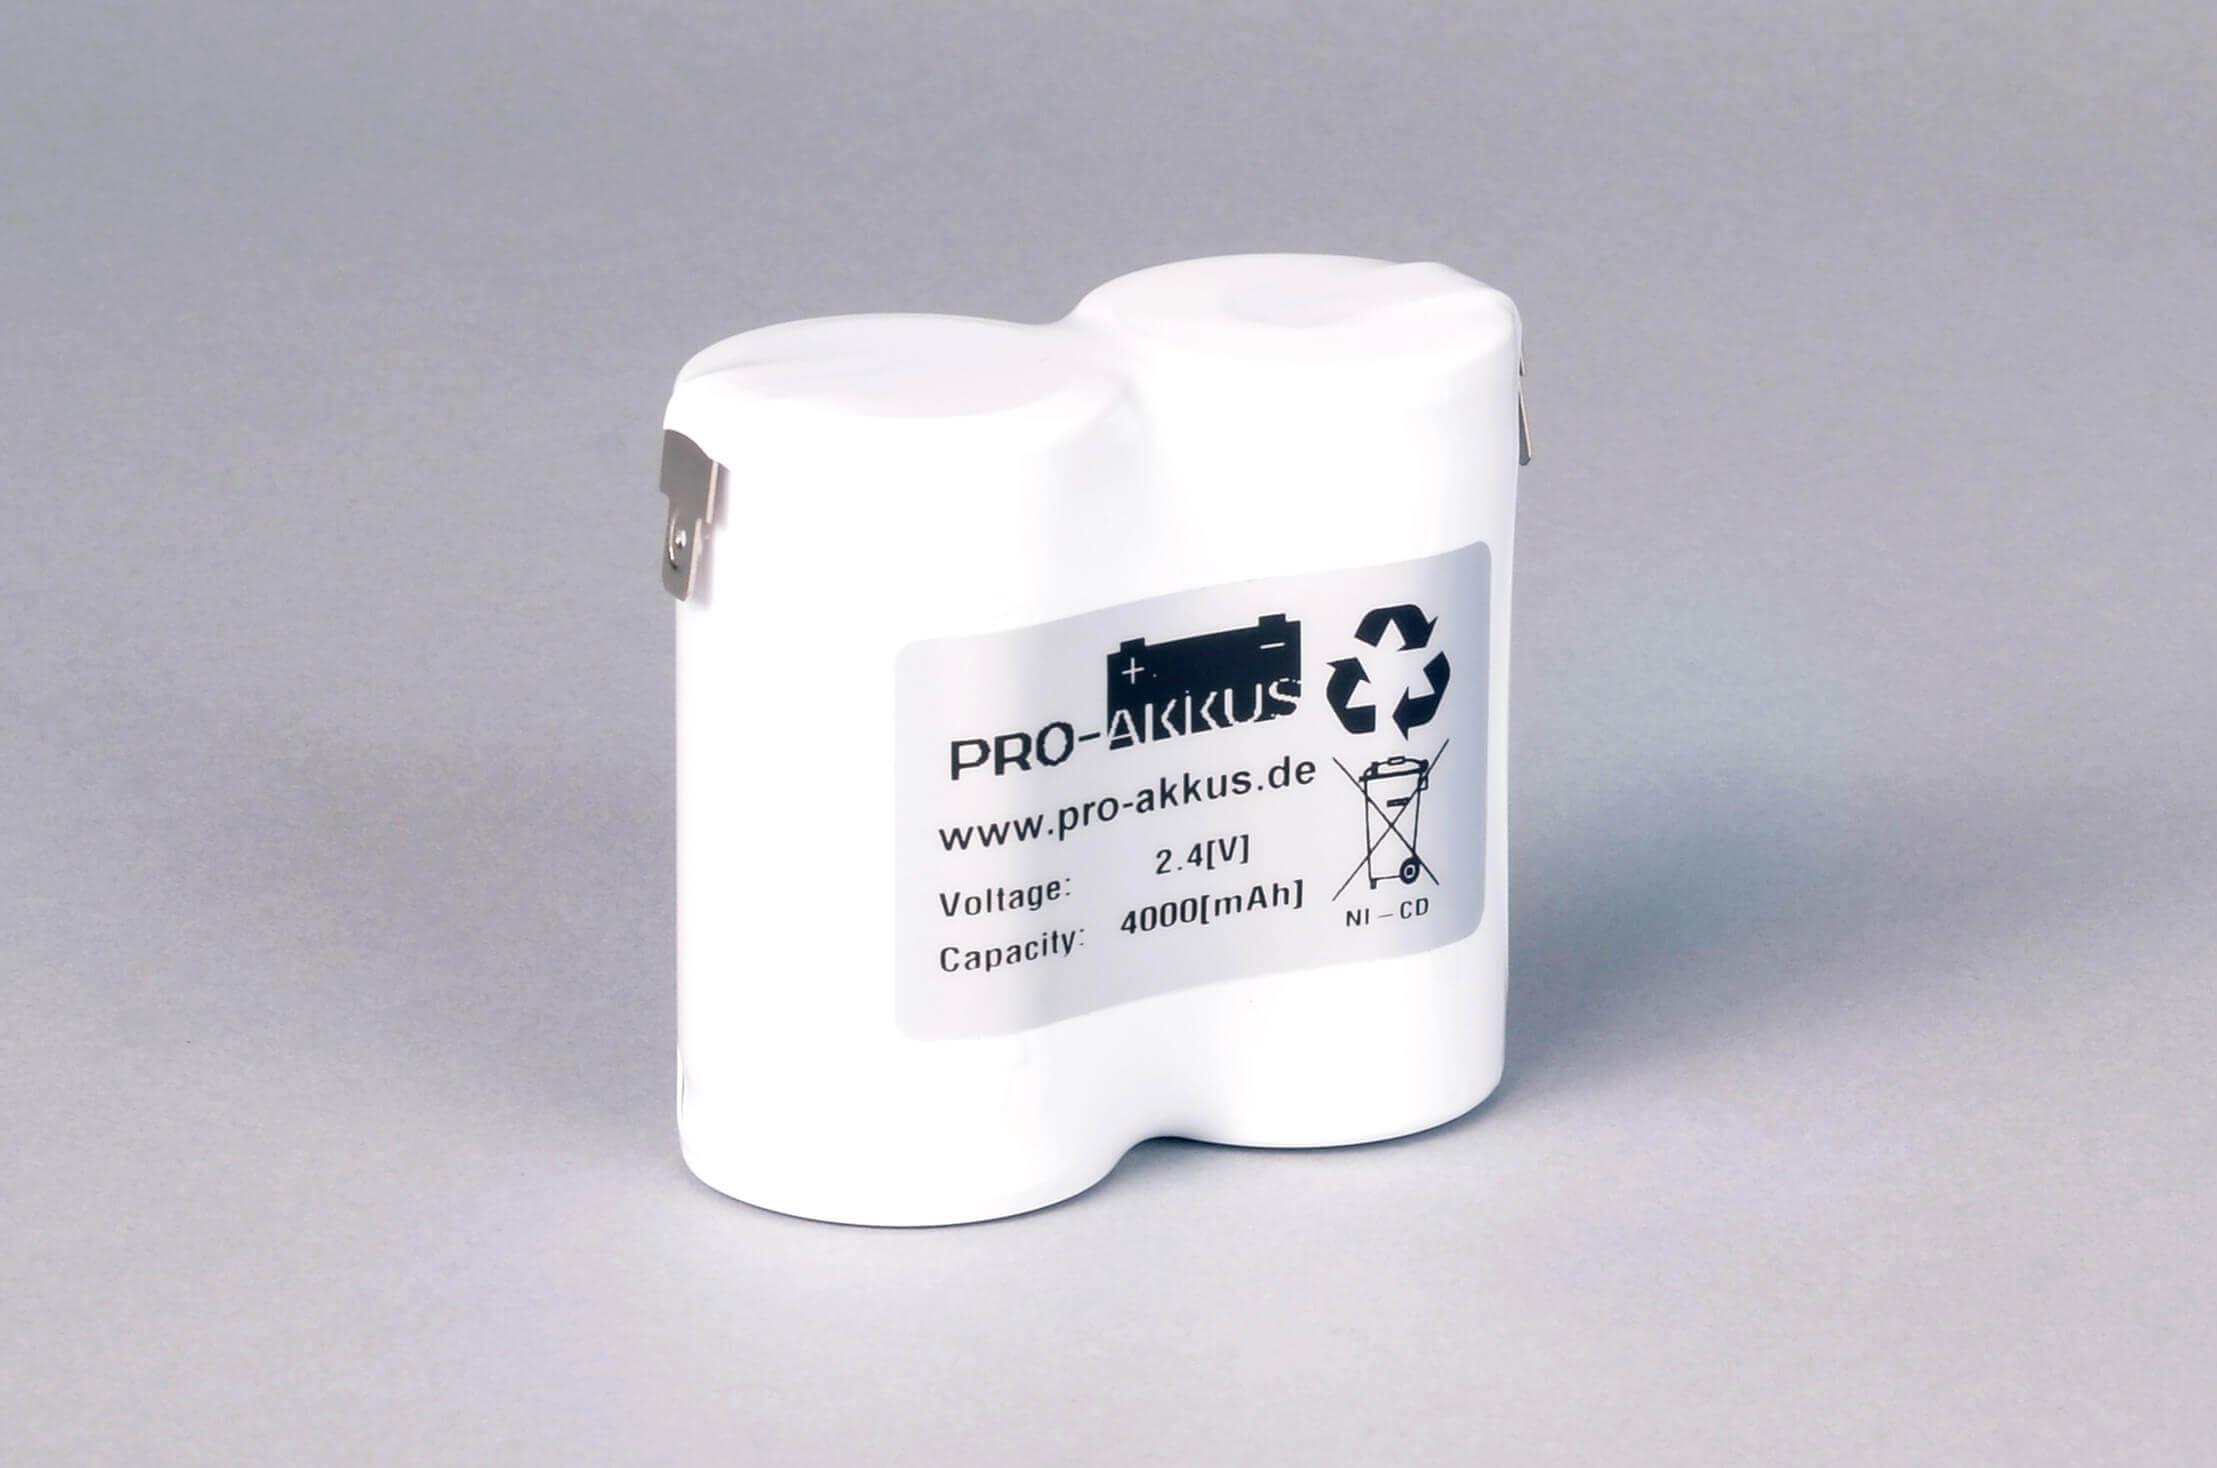 Ni-Cd Akkupack Notlicht Notbeleuchtung 2,4V / 4000mAh (4,0Ah) F2x1 Reihe, Faston Anschlüsse